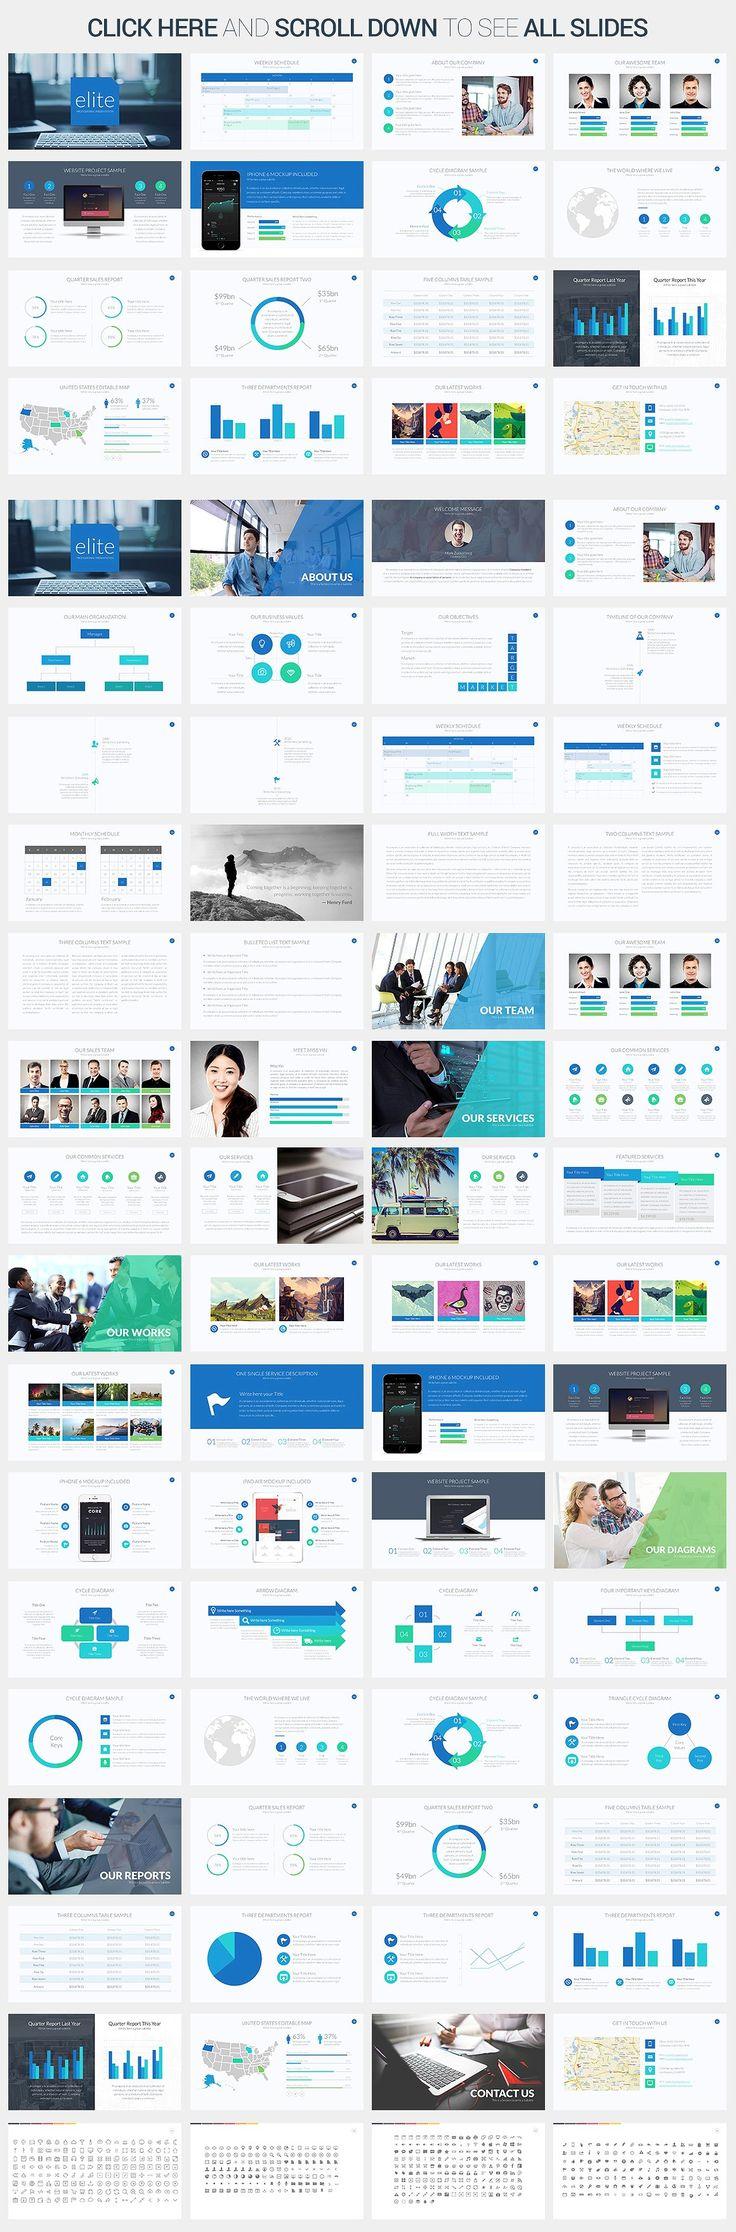 Elite Powerpoint Template by SlidePro on @creativemarket